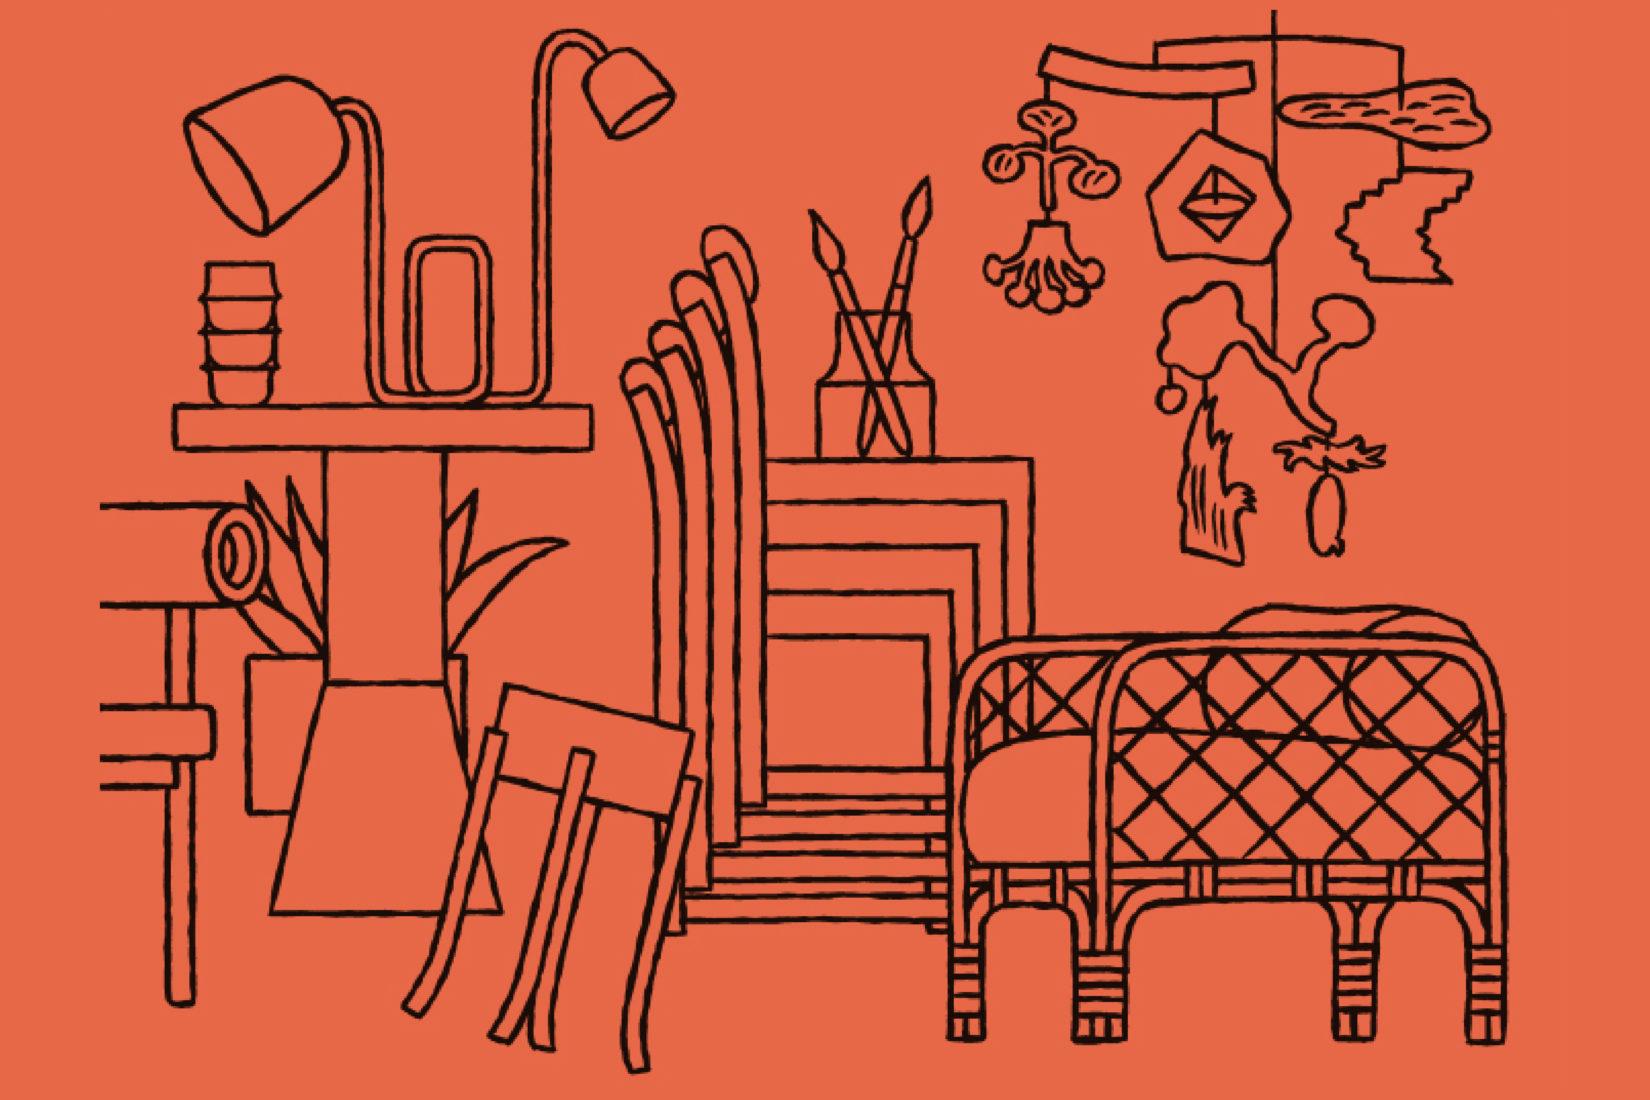 dessin noir sur fond orange, esprit minimlaliste, des objets et du mobiler